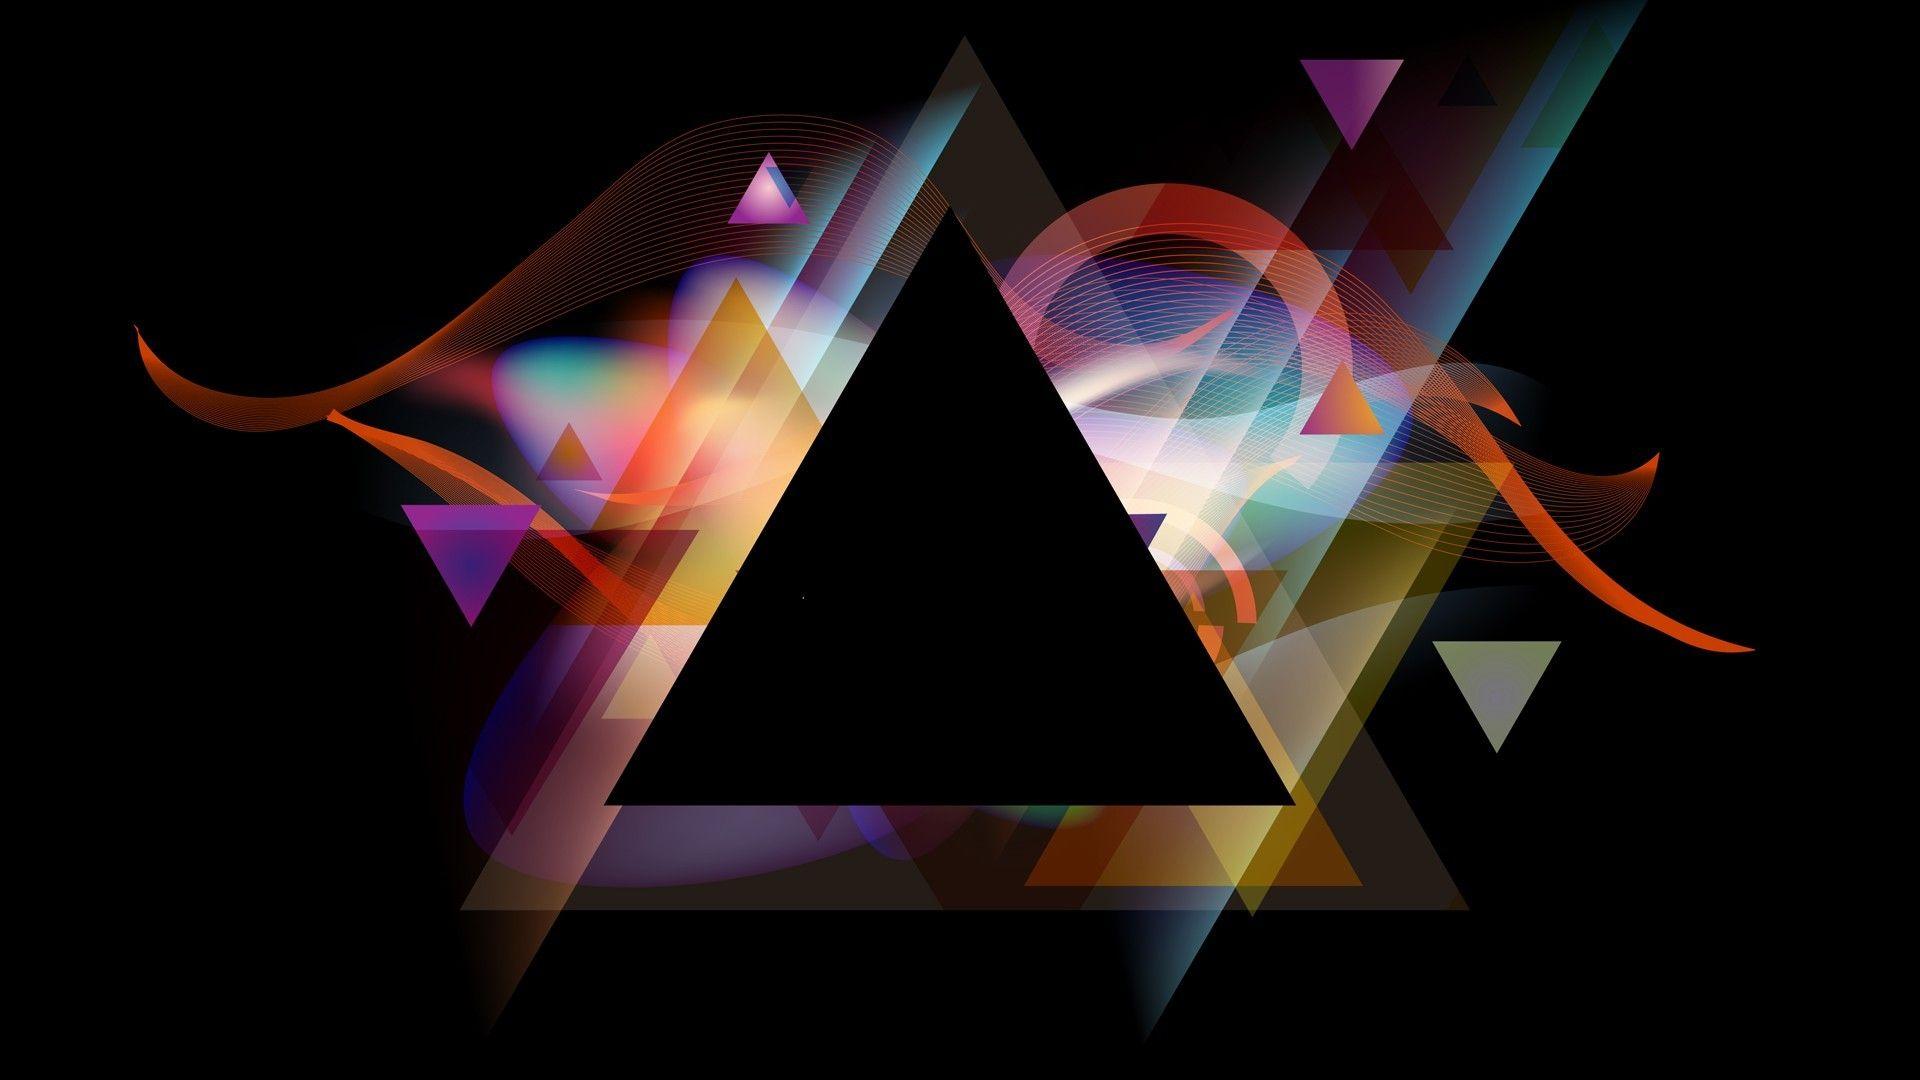 Beautiful illuminati wide high resolution wallpaper hd creativo outstanding hd illuminati wallpapers for ipad voltagebd Gallery